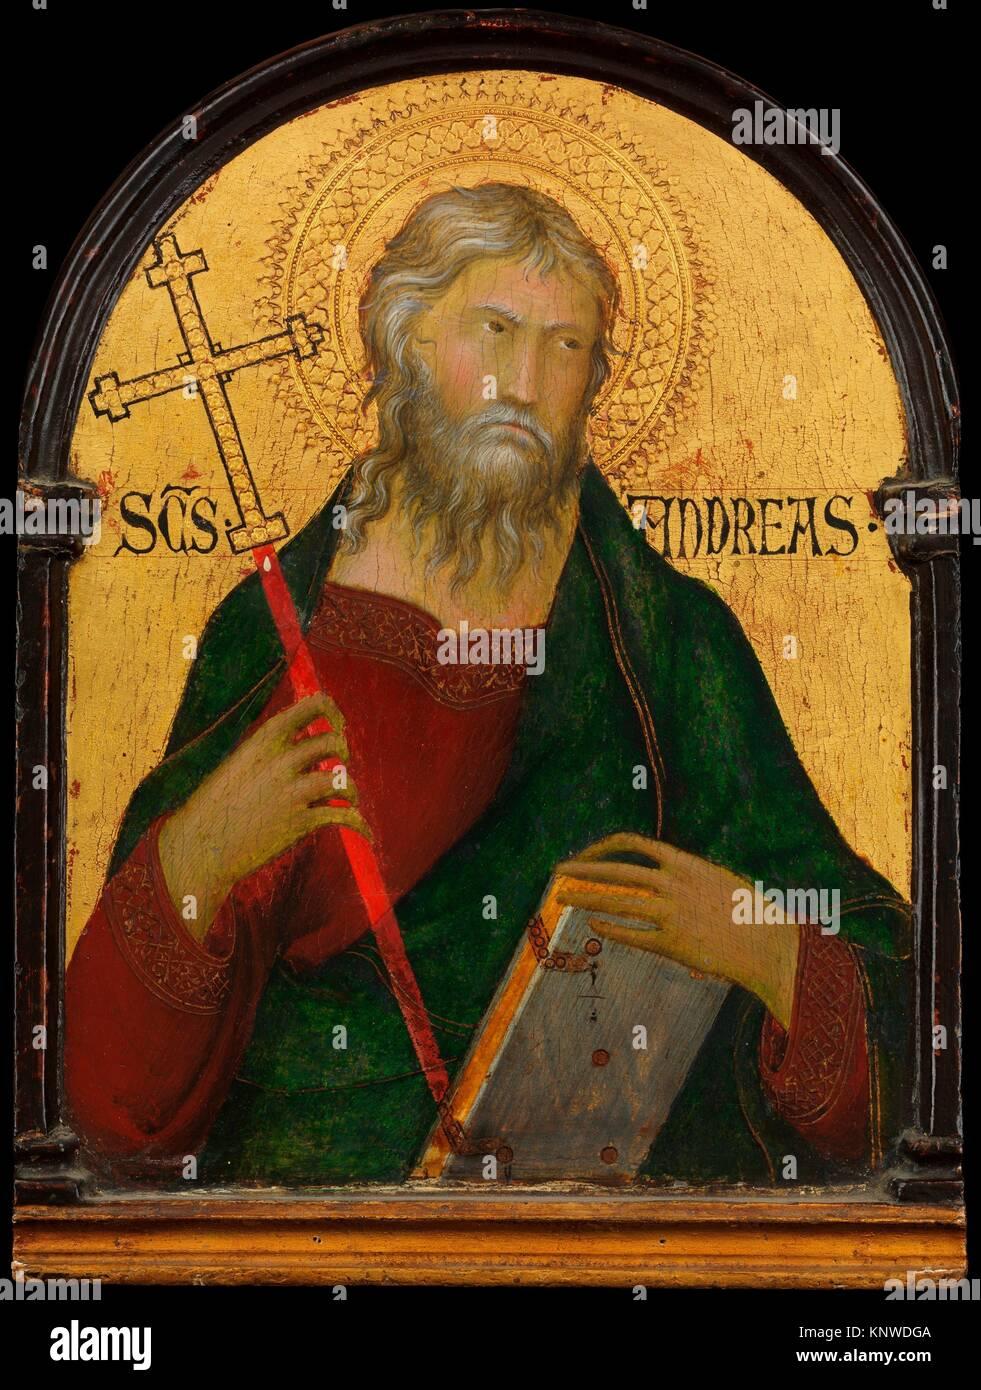 San Andrés. Artista: Taller de Simone Martini (Italiano, Siena, activo en 1315 y murió 1344 Aviñón); Fecha: ca. Foto de stock